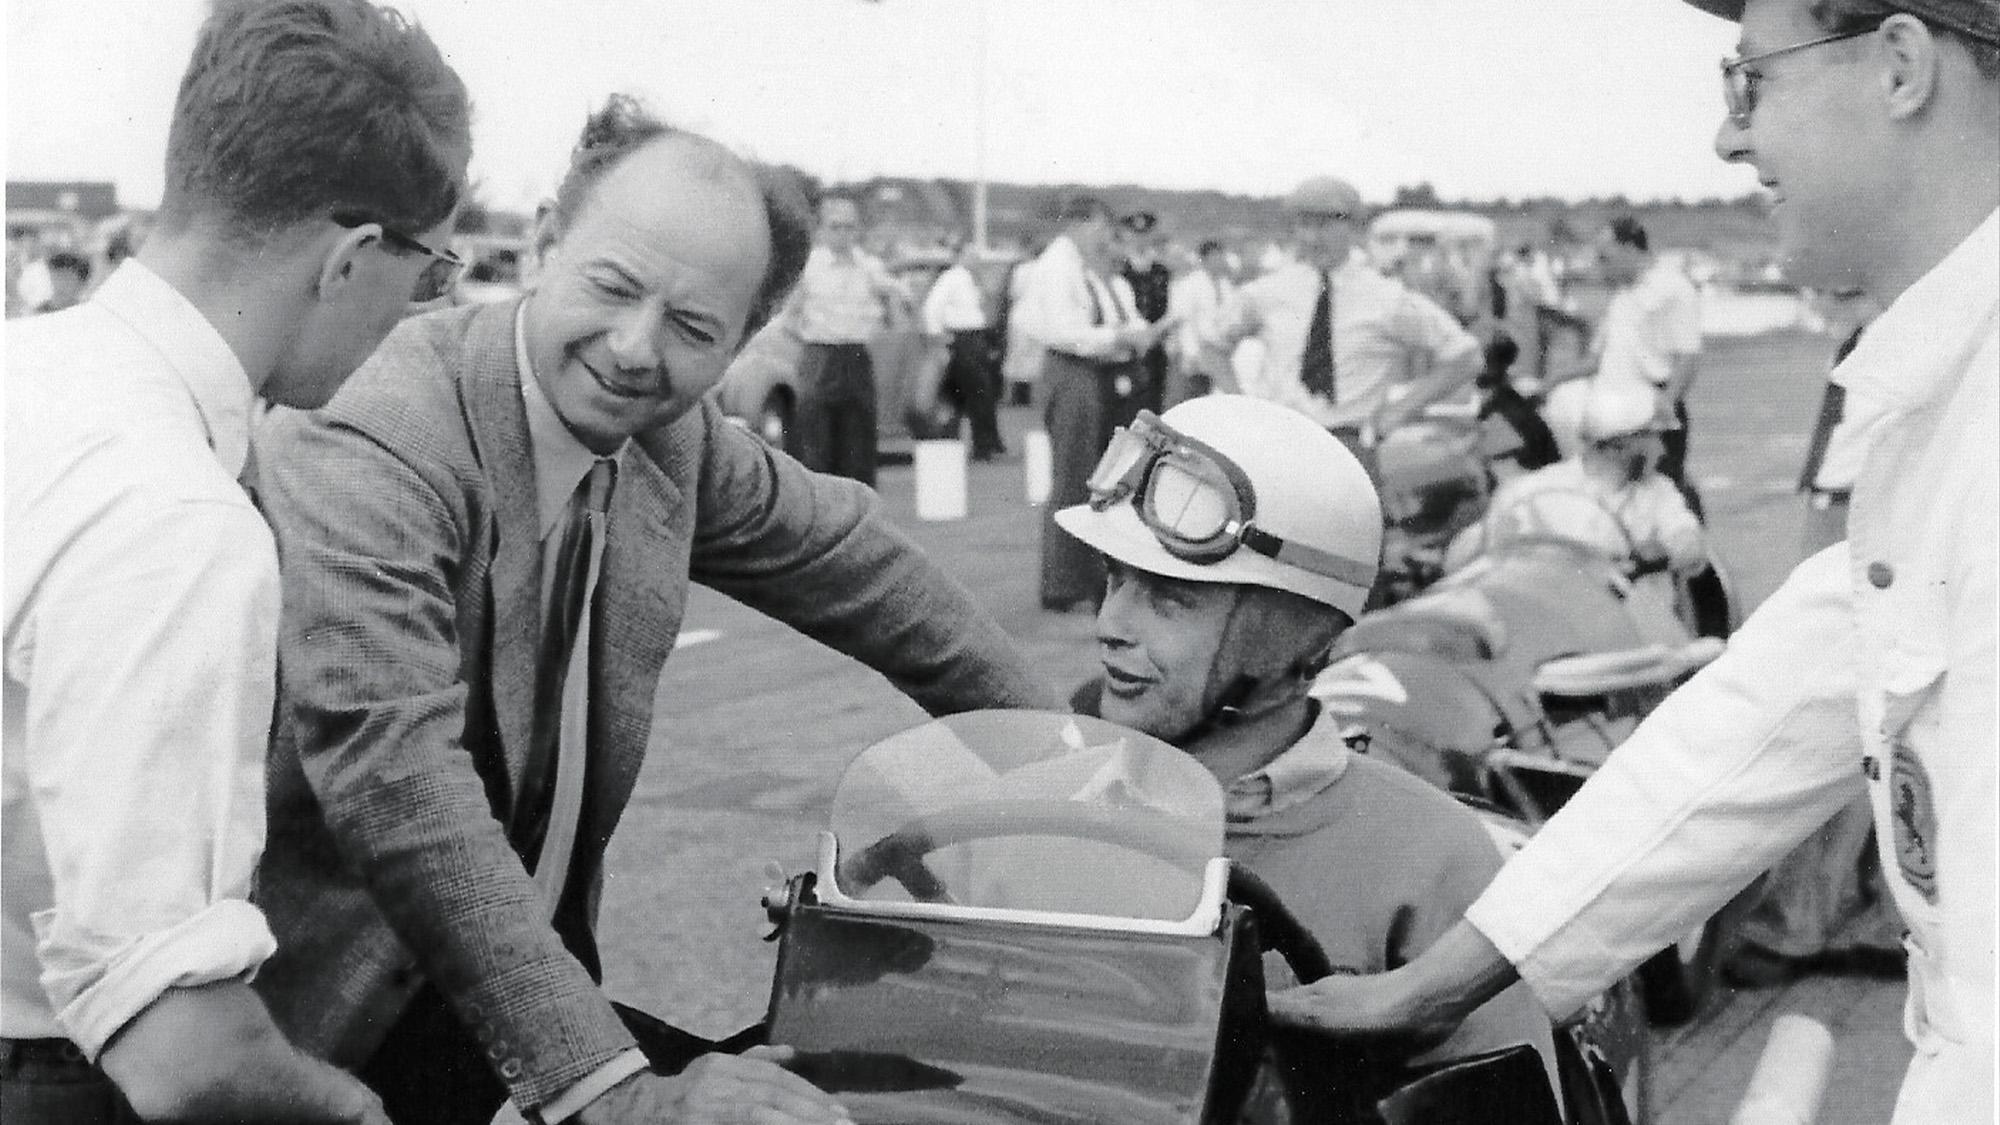 Raymond Mays wih Ron Flockhart and Hugh Langrishe